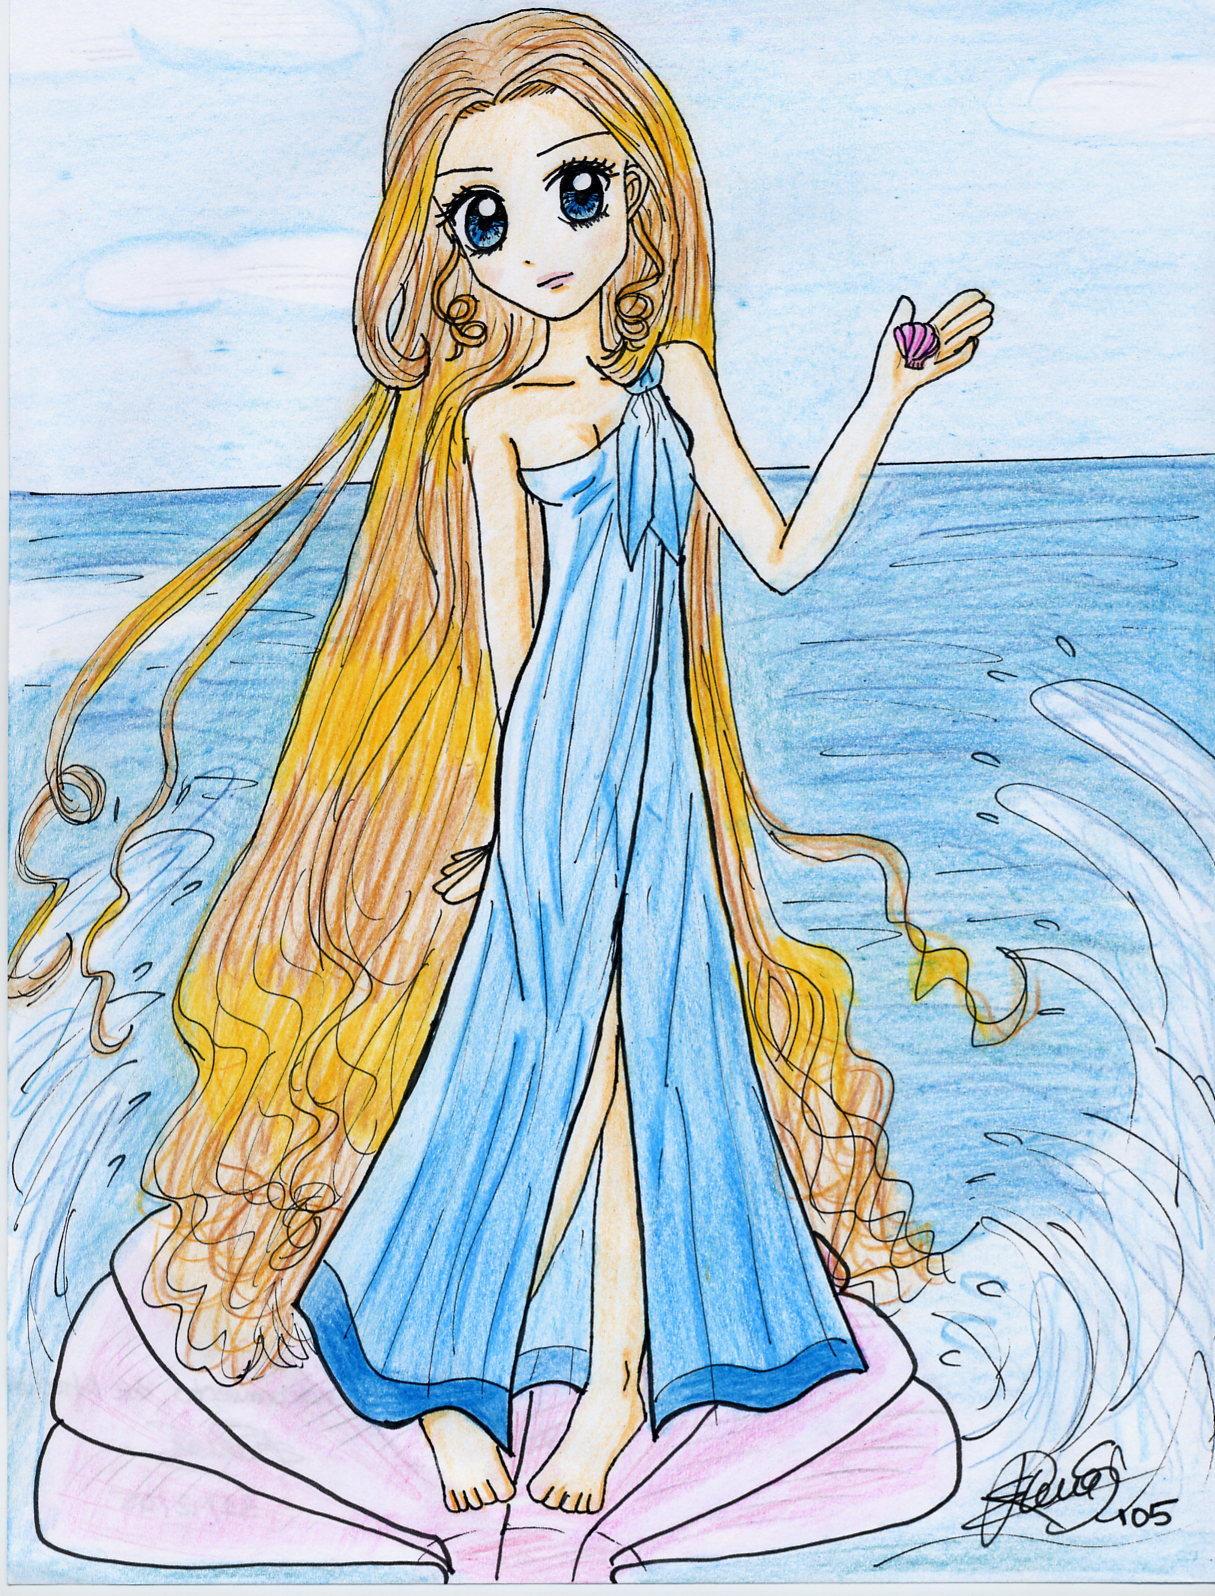 Aphrodite's Birth by ElenaGranger on DeviantArt